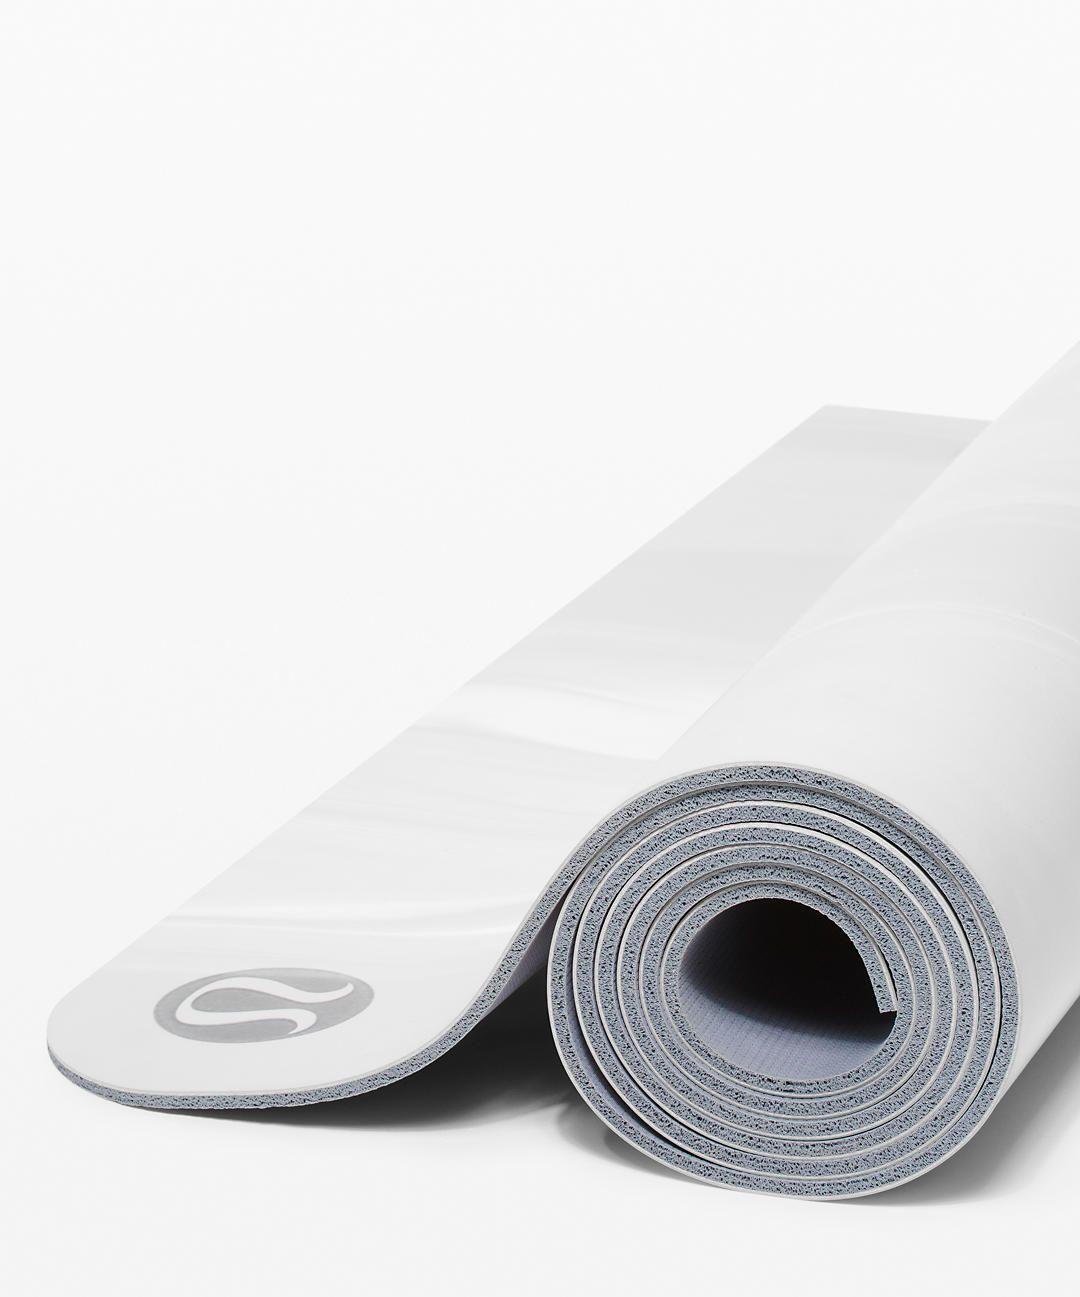 The Reversible (Big) Mat 5mm Women's Yoga Mats